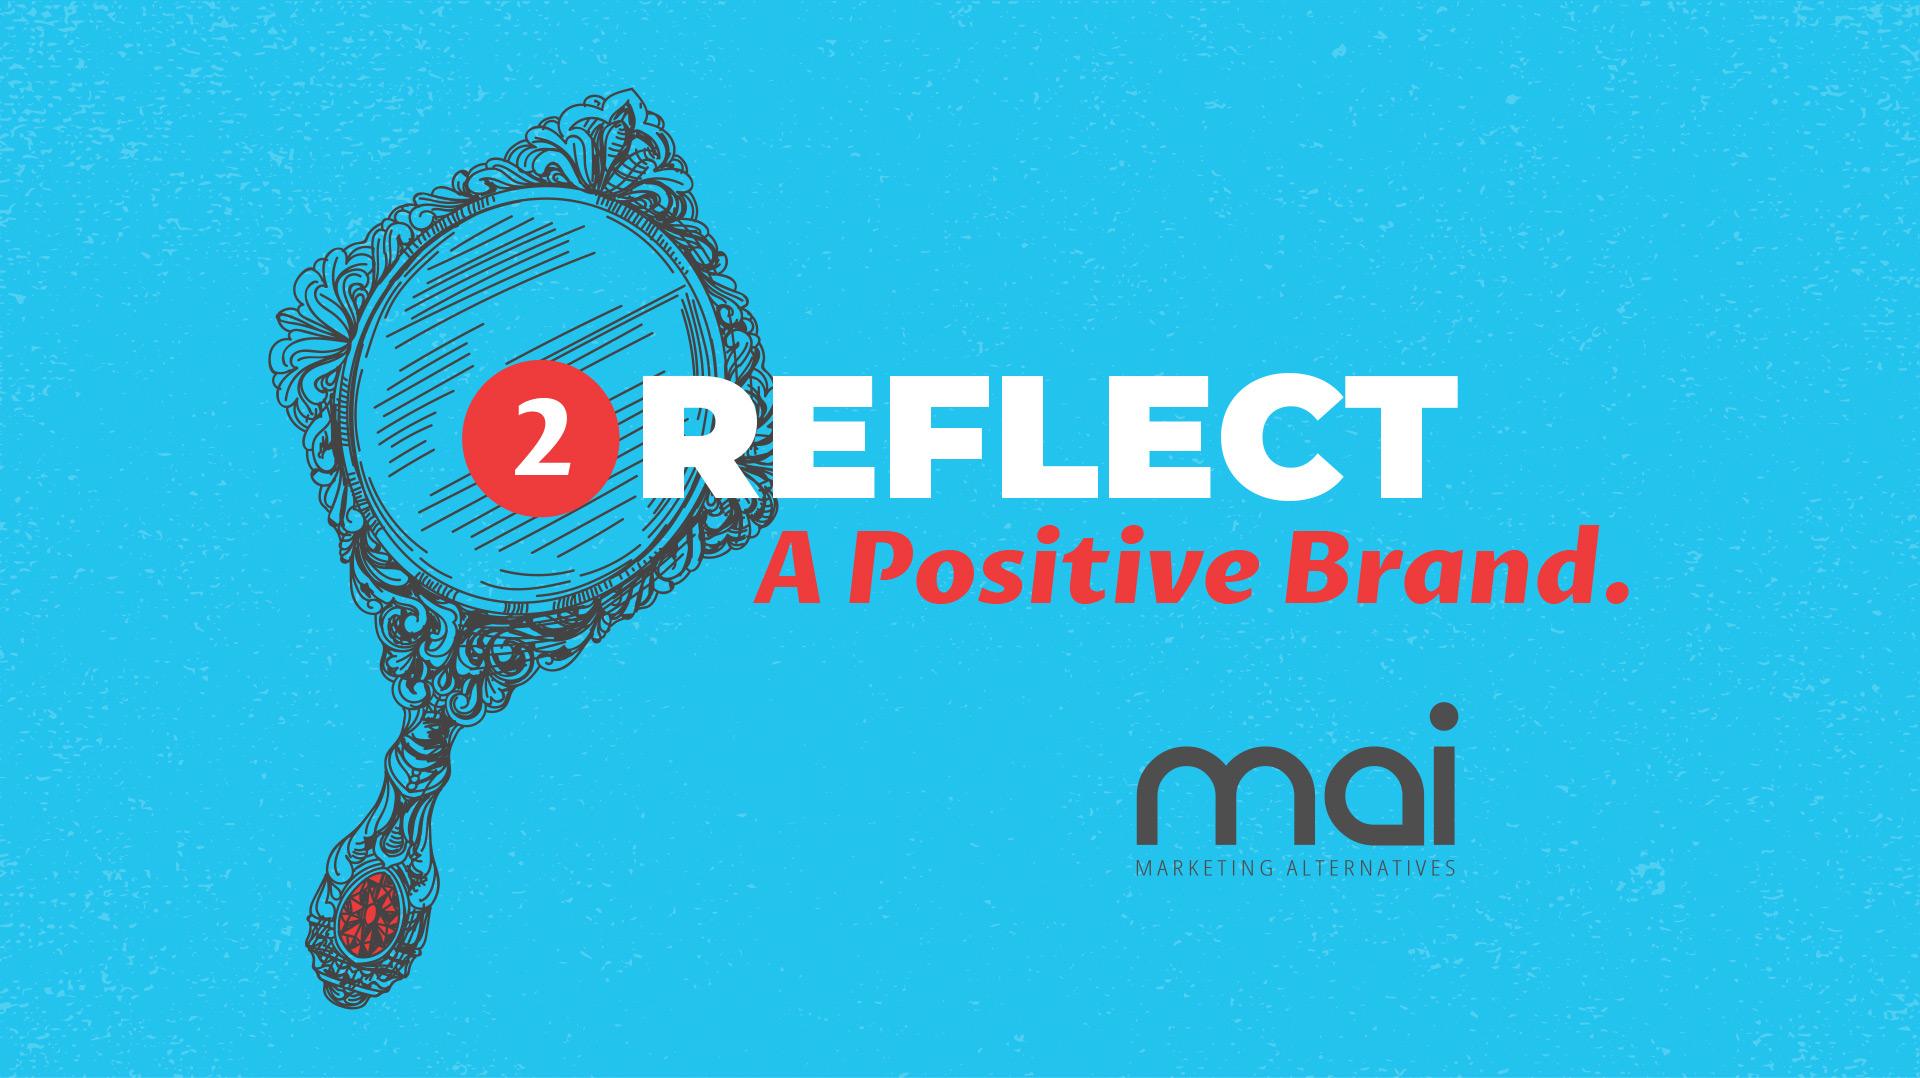 Reflect A Positive Brand.